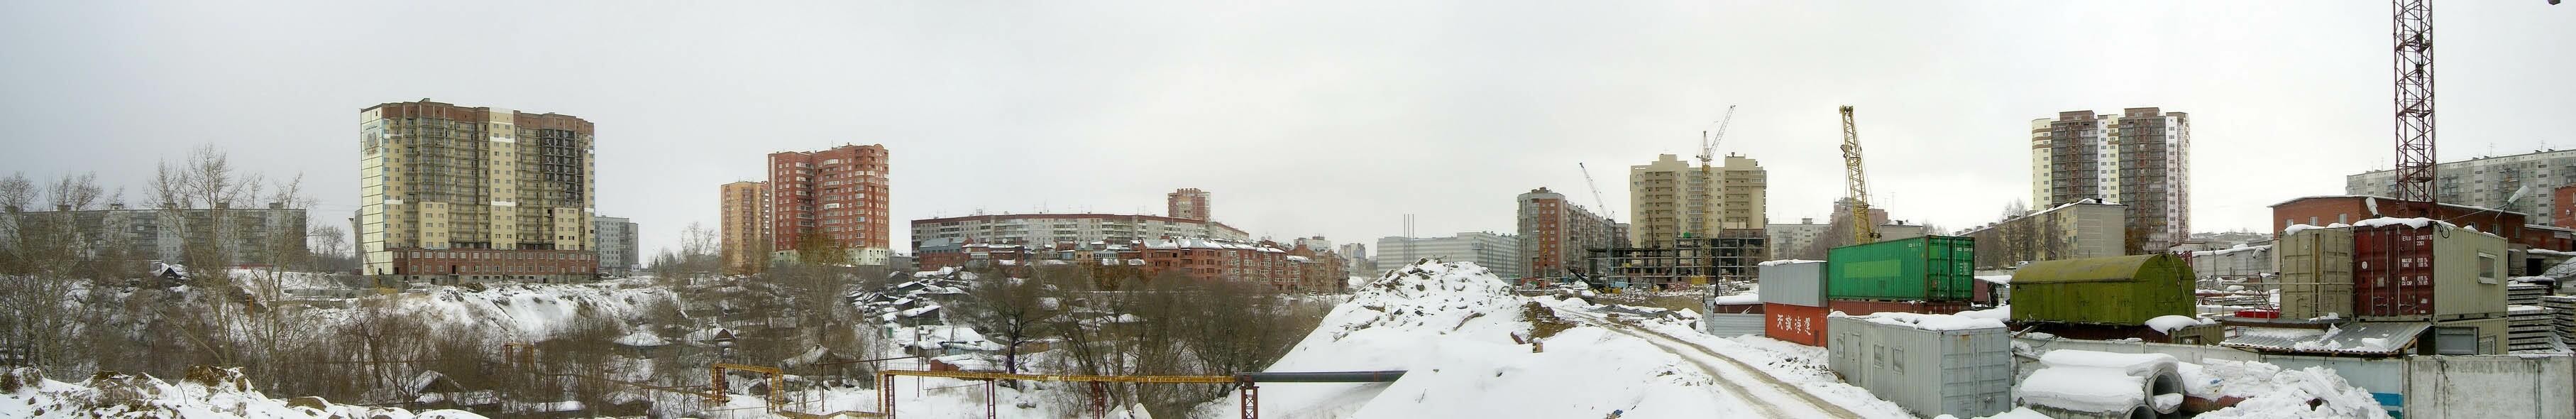 http://nskstreets.narod.ru/image11/Galuschaka_06.jpg